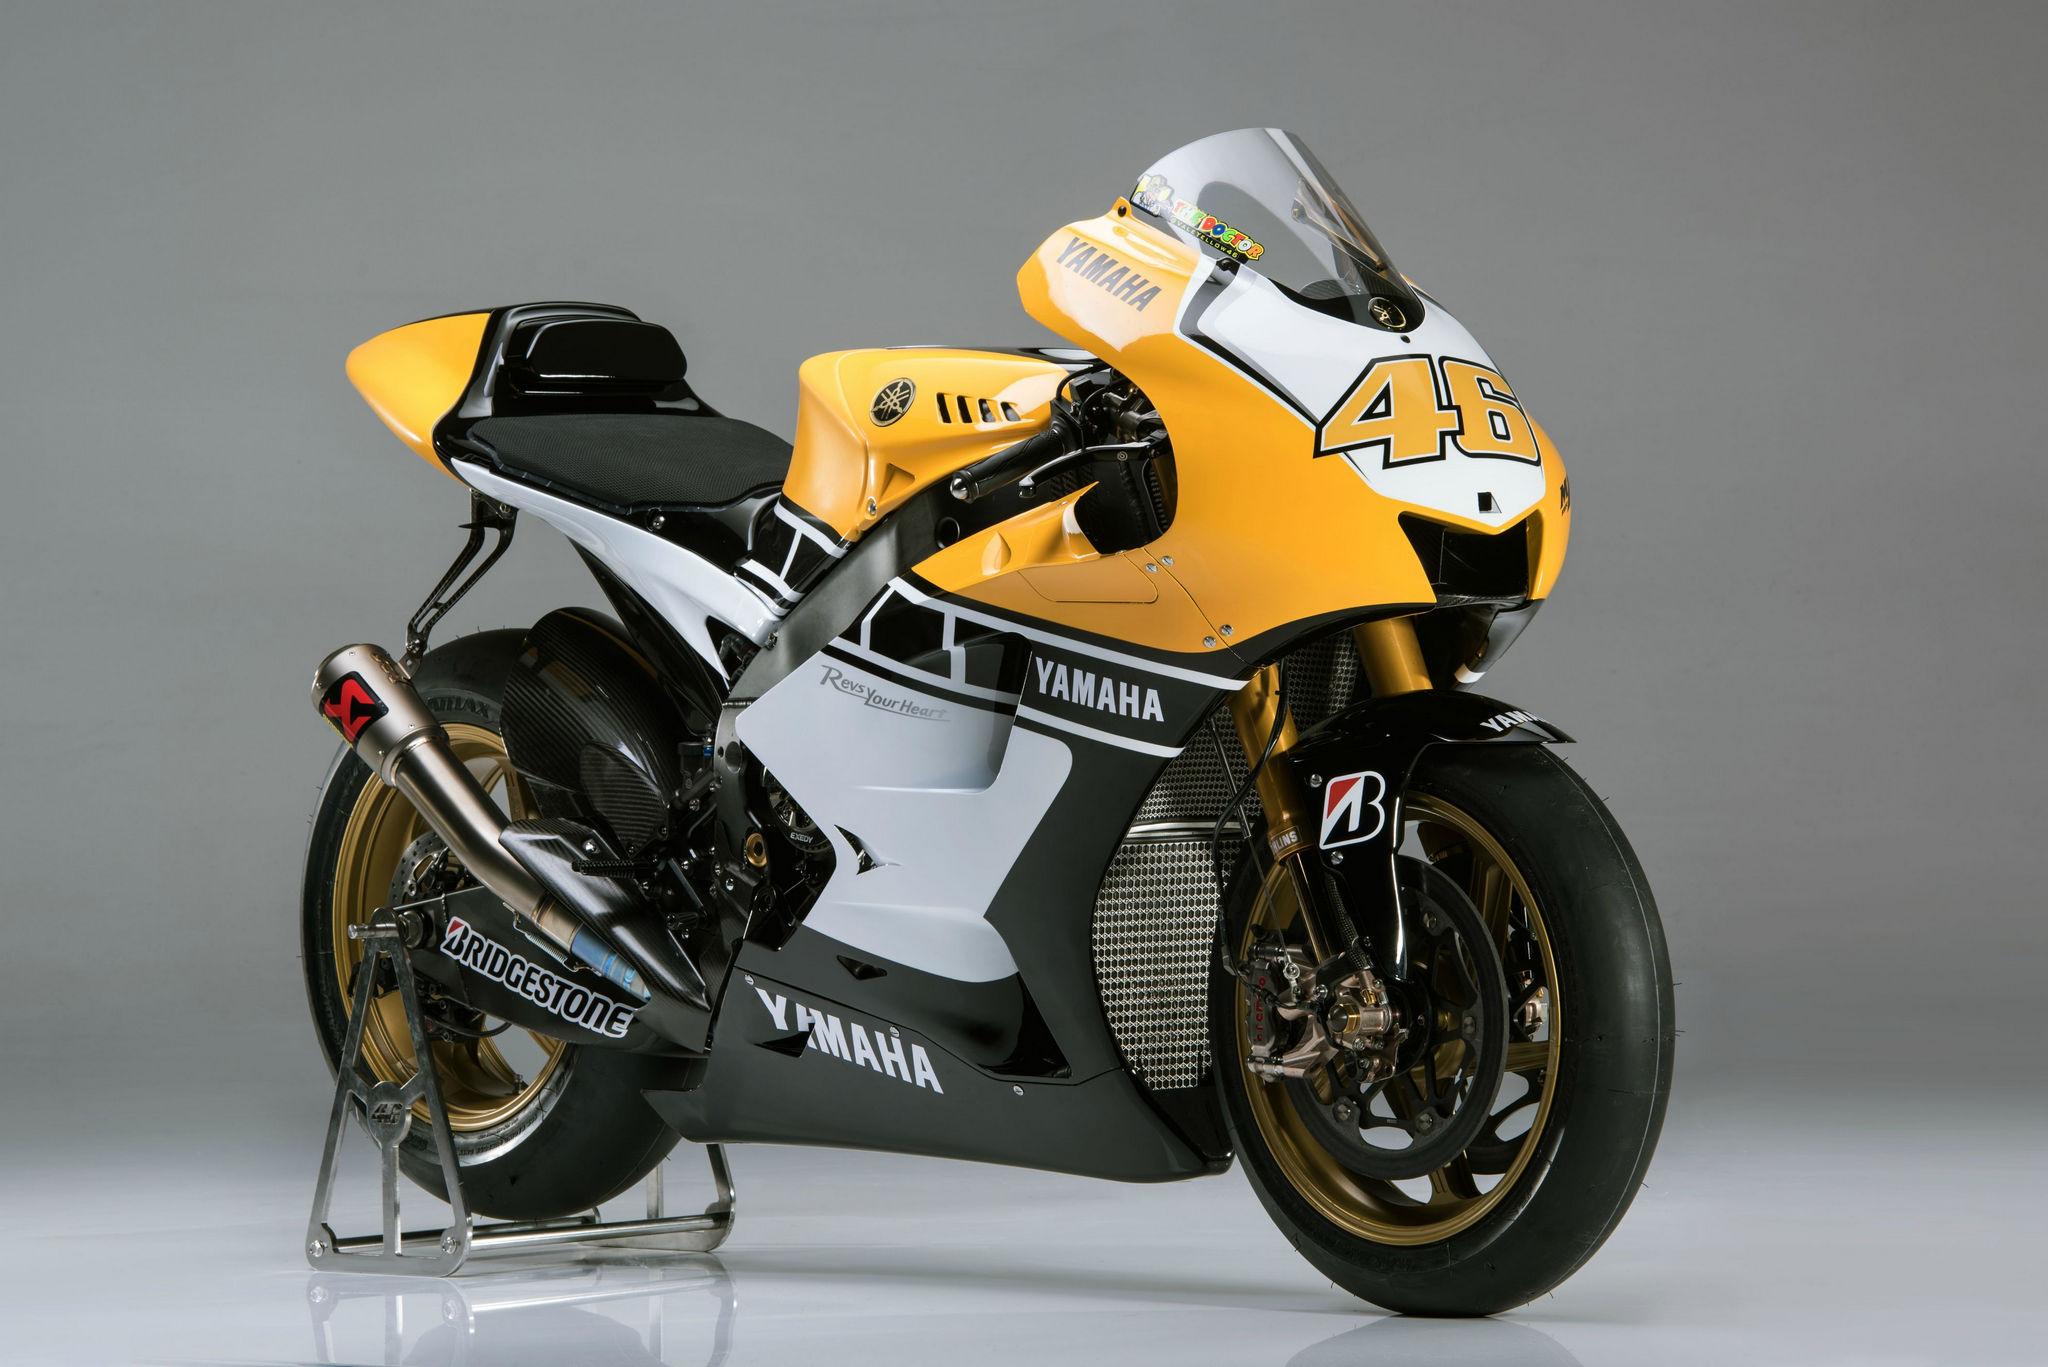 Yamaha YZR-M1 (60-летие марки, 2015)